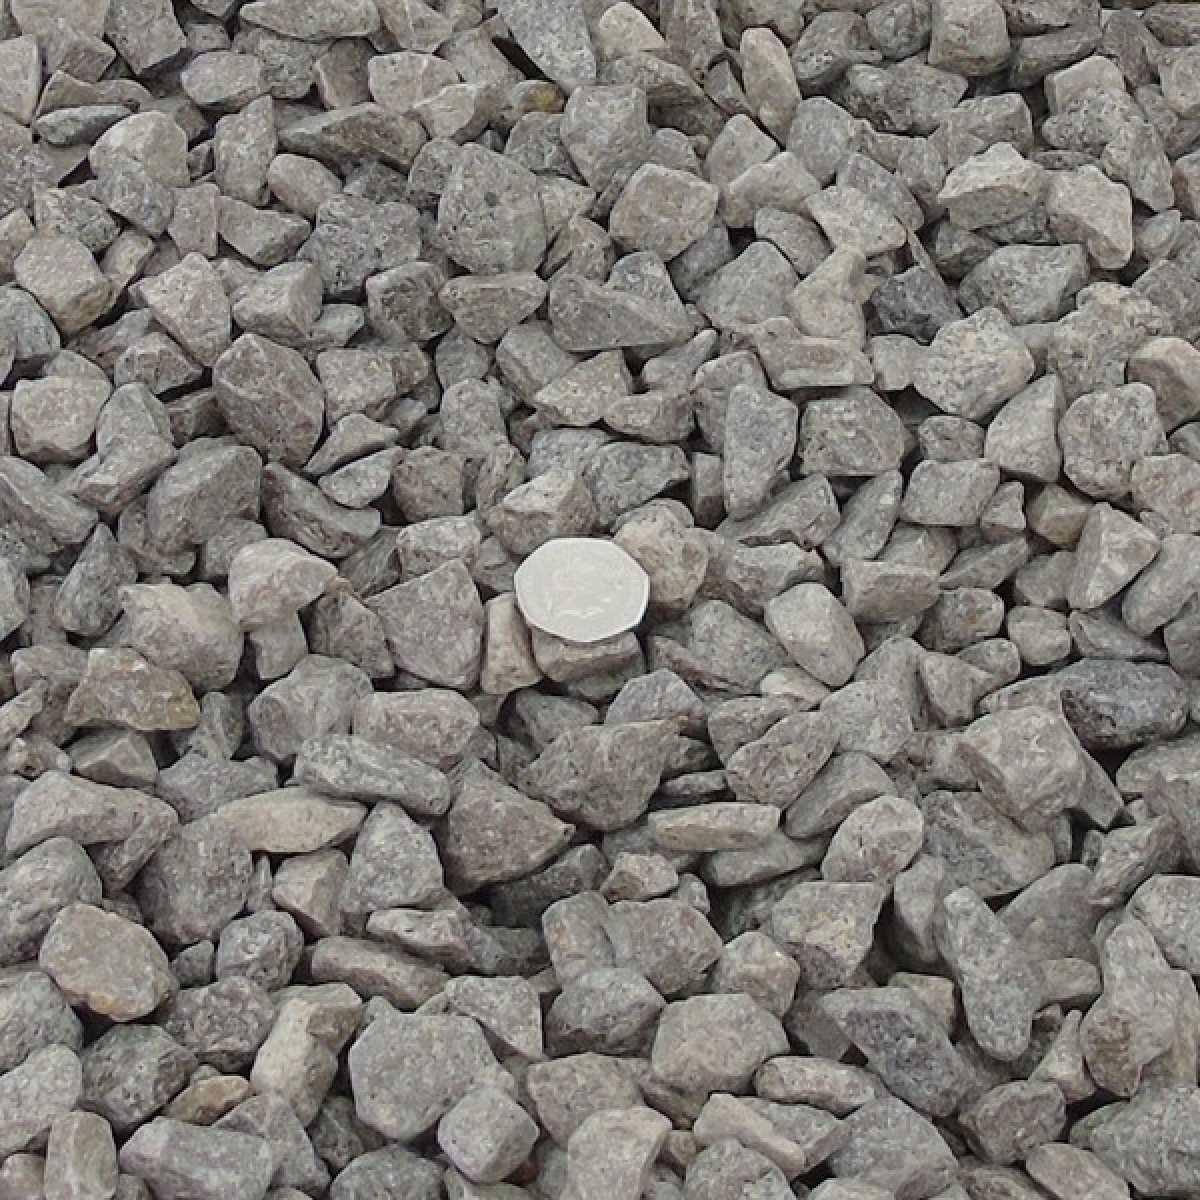 20mm black basalt dry Image by Websters Timber